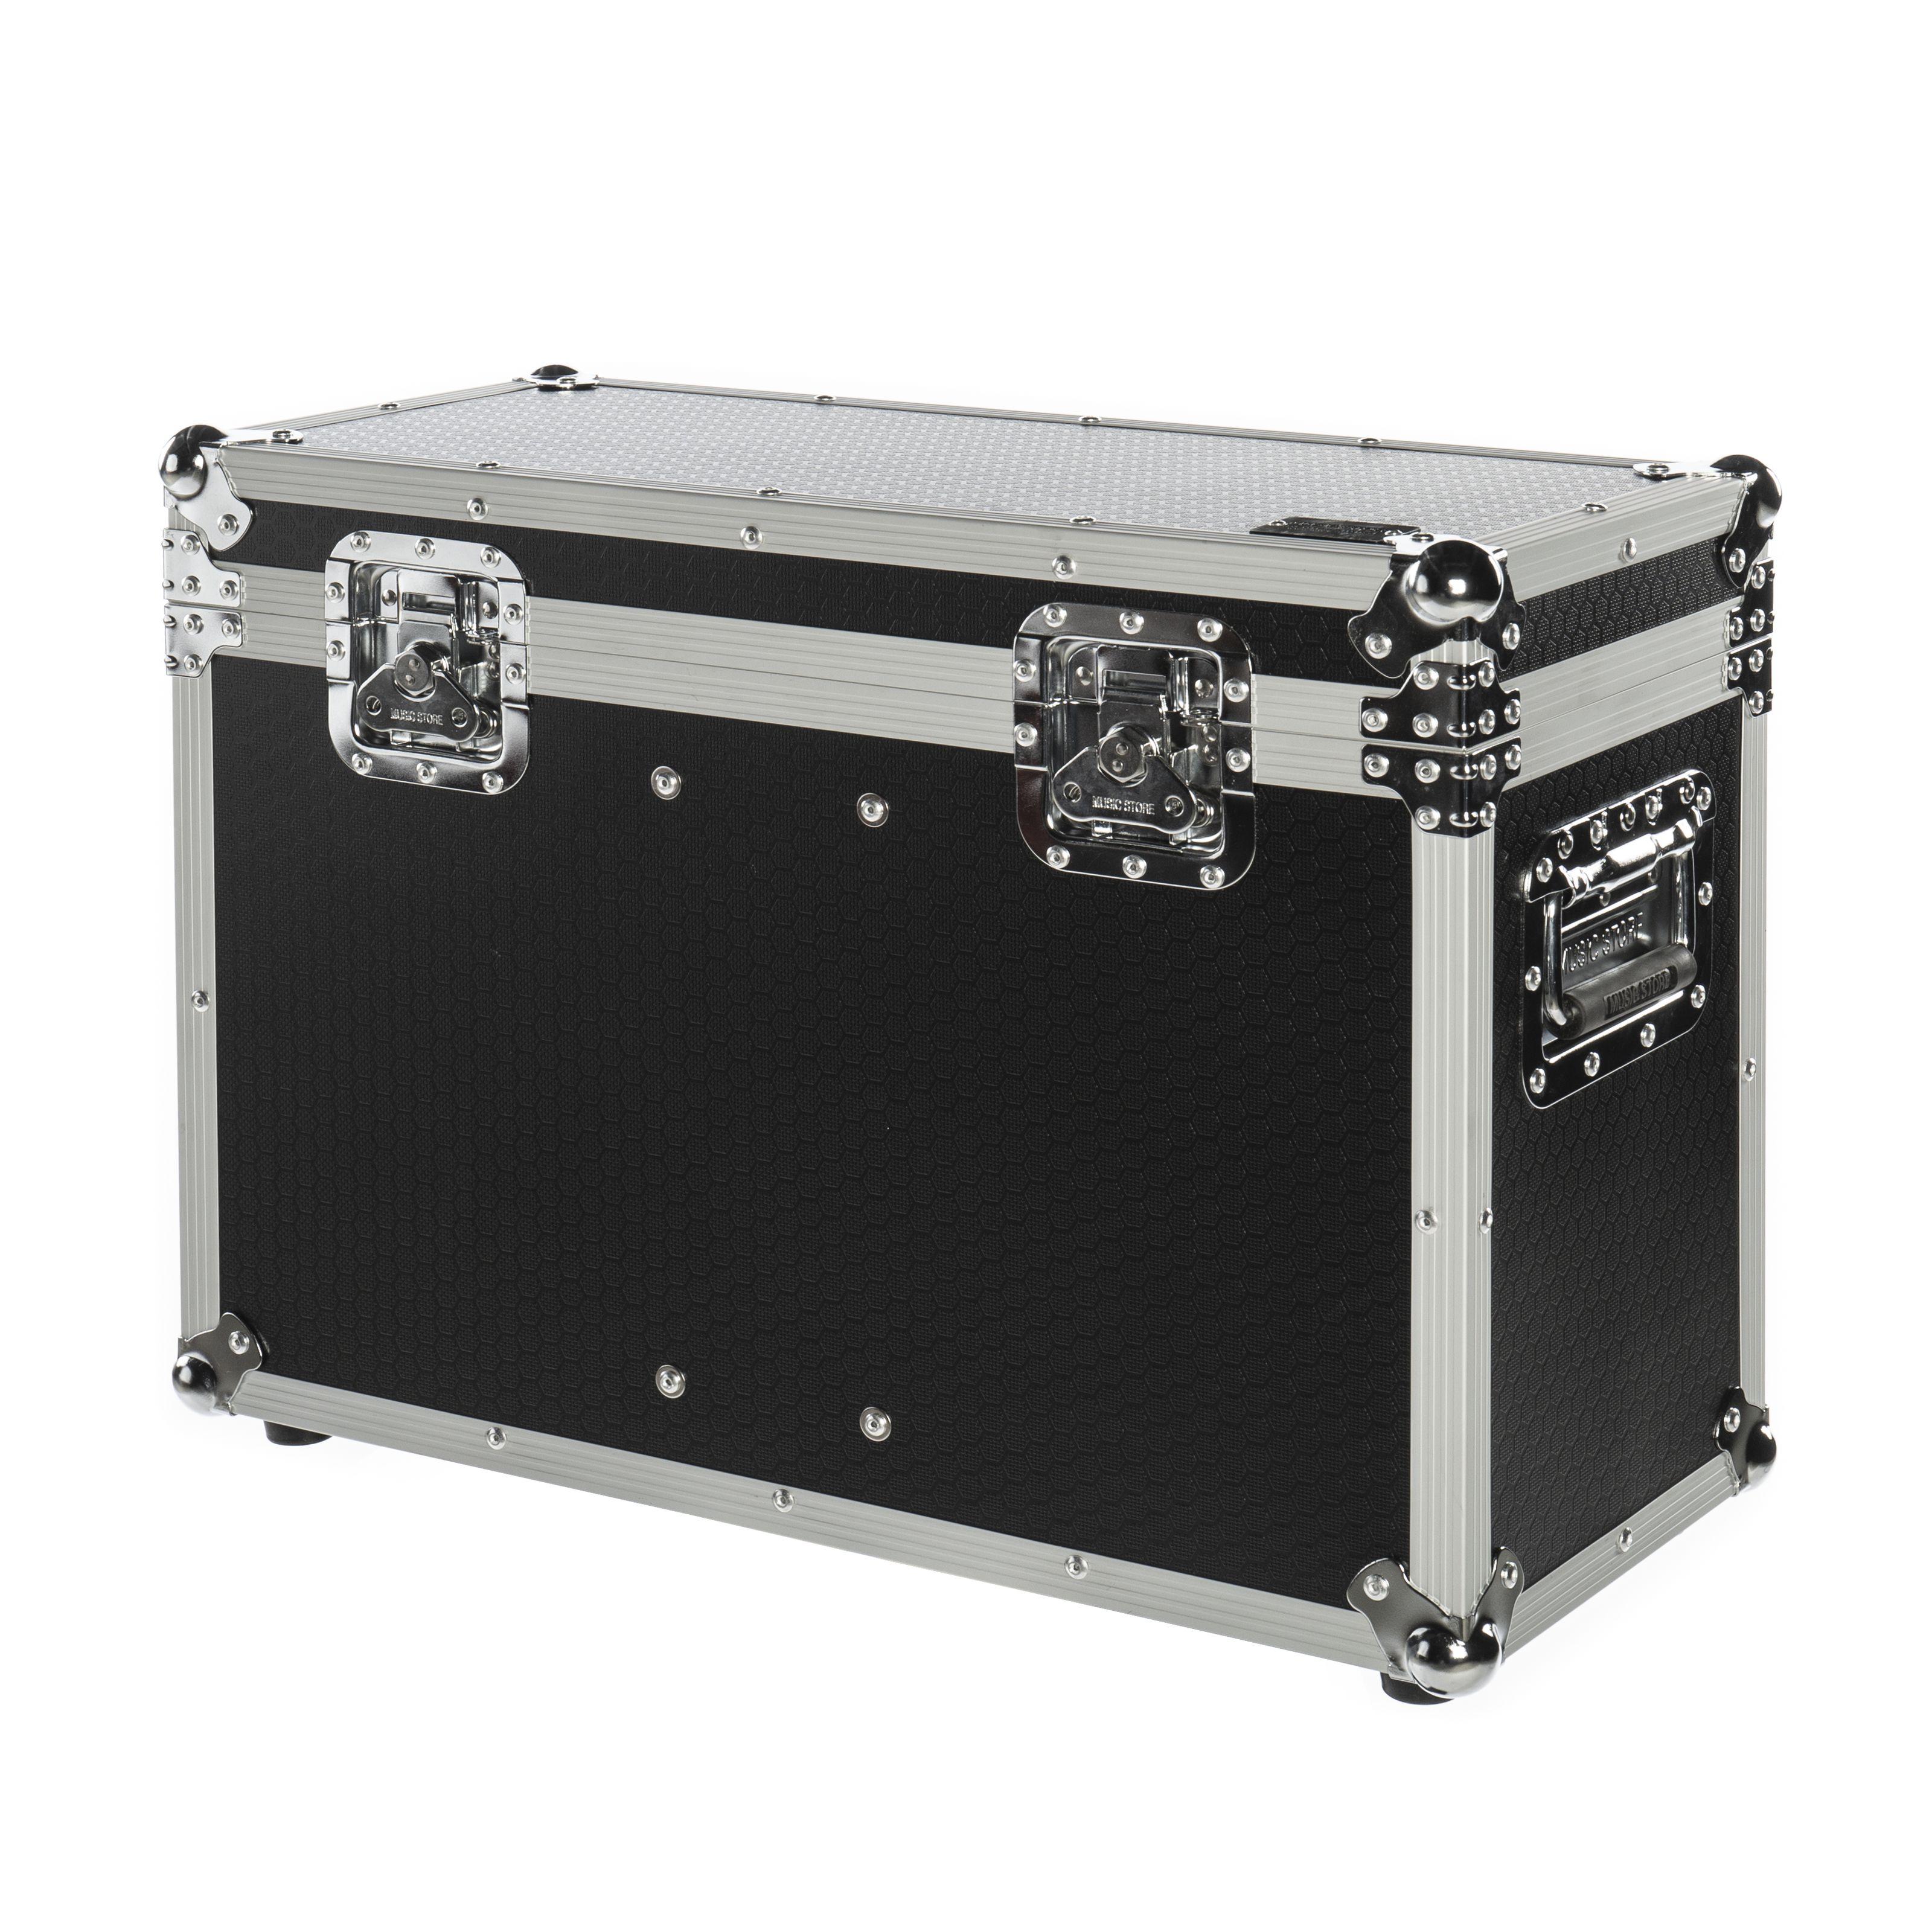 MUSIC STORE - TOUR CASE 2x Phantom Spot 65 Case 2x Phantom 65